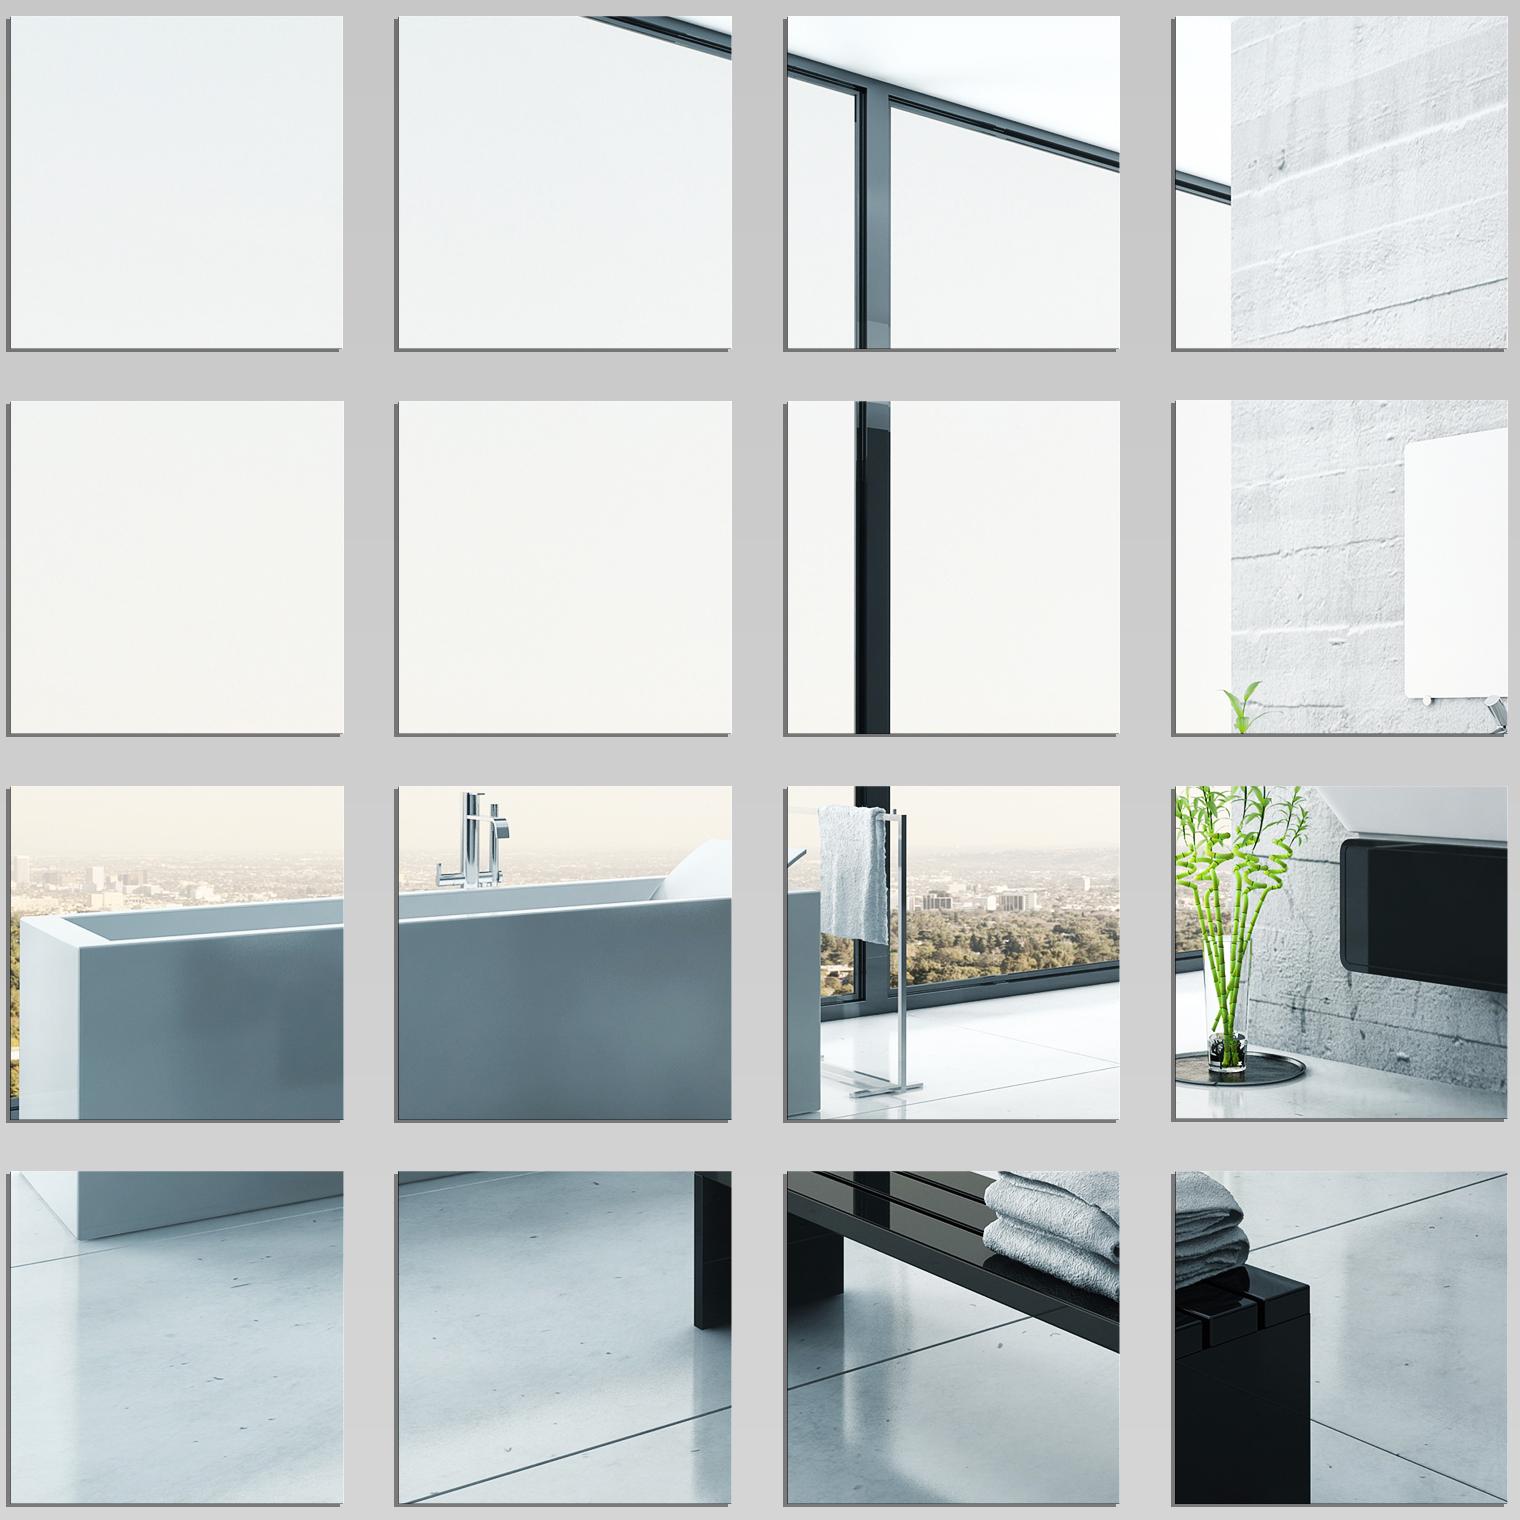 wandtattoos folies wandspiegel aus acrylglas quadrat set. Black Bedroom Furniture Sets. Home Design Ideas